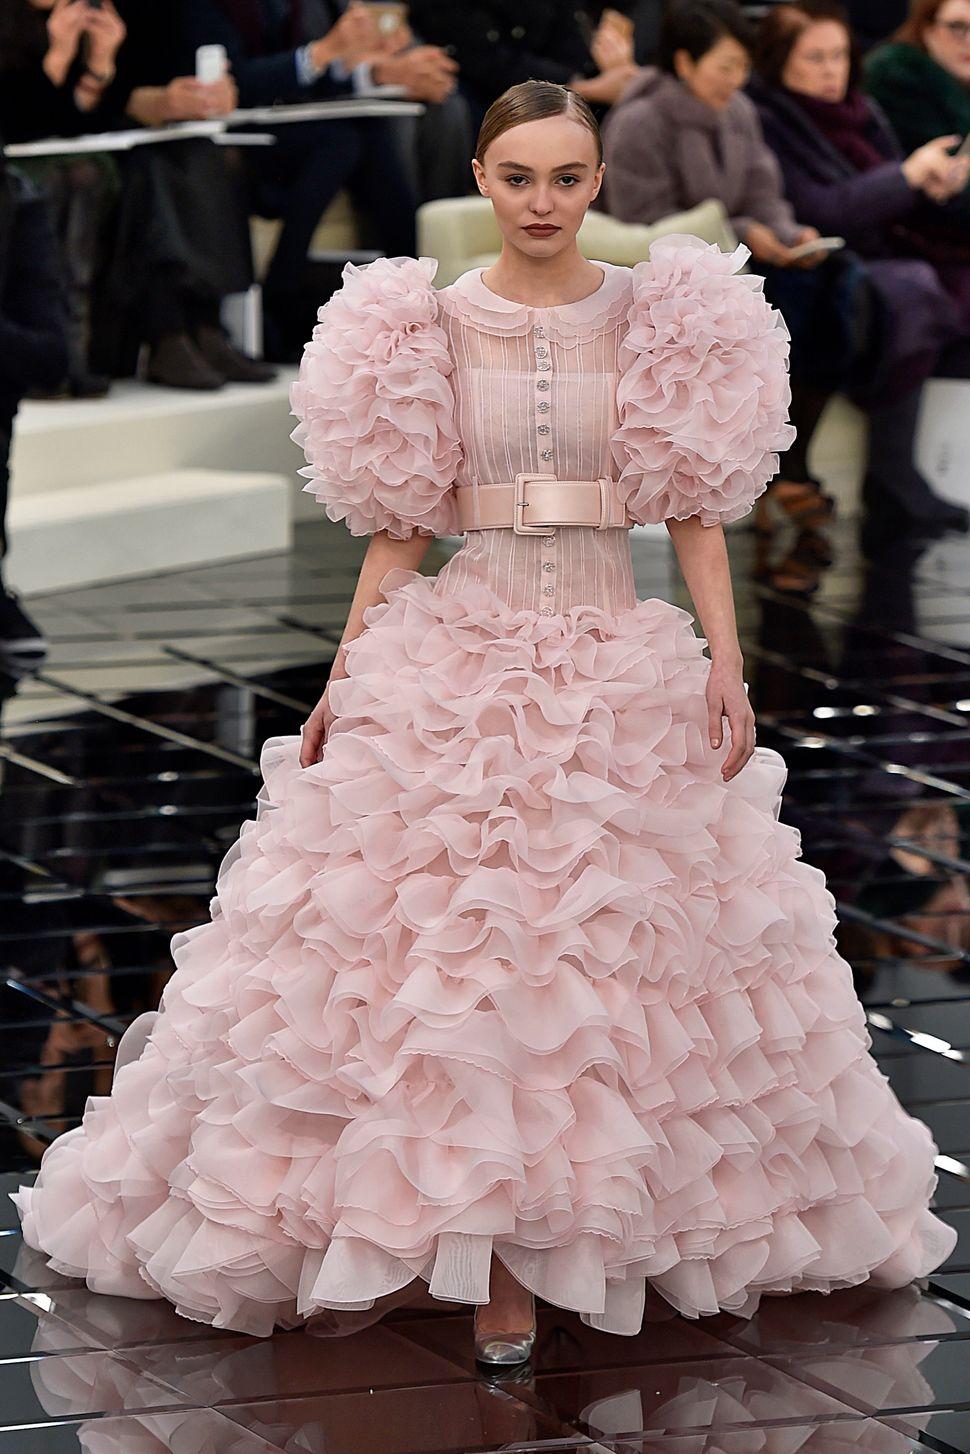 Paris Fashion Week 2017: The 19 Dreamiest Haute Couture Wedding ...